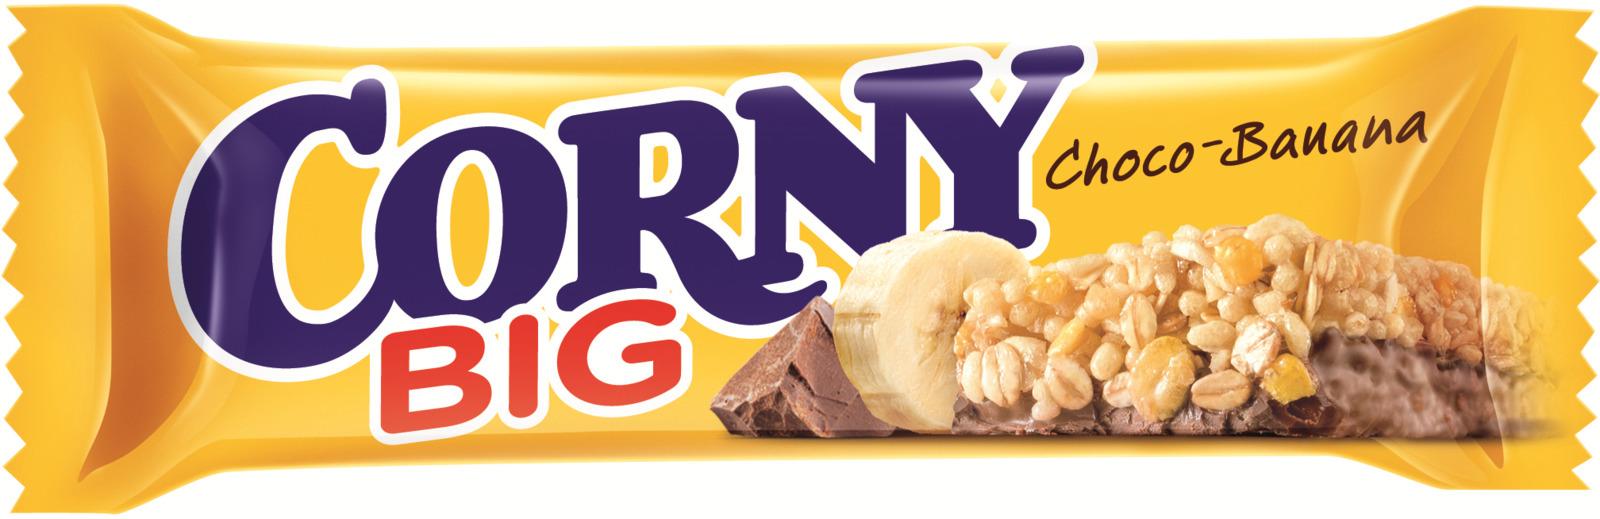 Corny Chocolate-Banana батончик злаковый с бананом и молочным шоколадом, 50 г corny milk cocoa батончик злаковый c молоком и какао 30 г